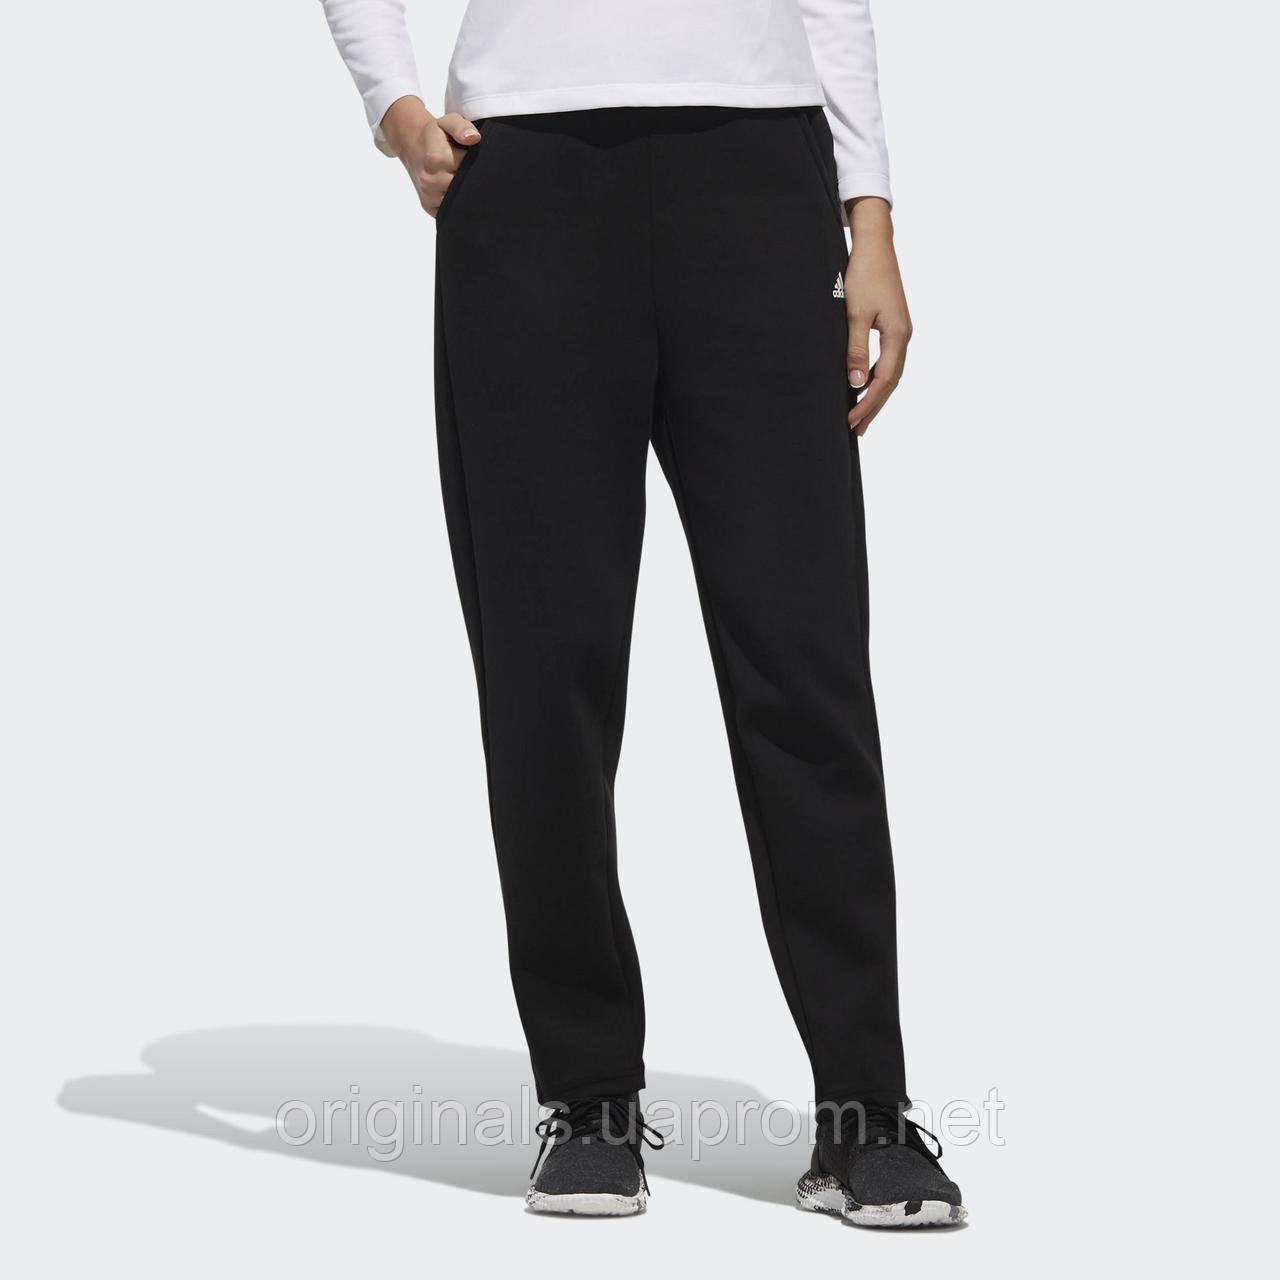 848ae228 Женские штаны Adidas Sport 2 Street DV0765 - 2019 - интернет-магазин  Originals - Оригинальный